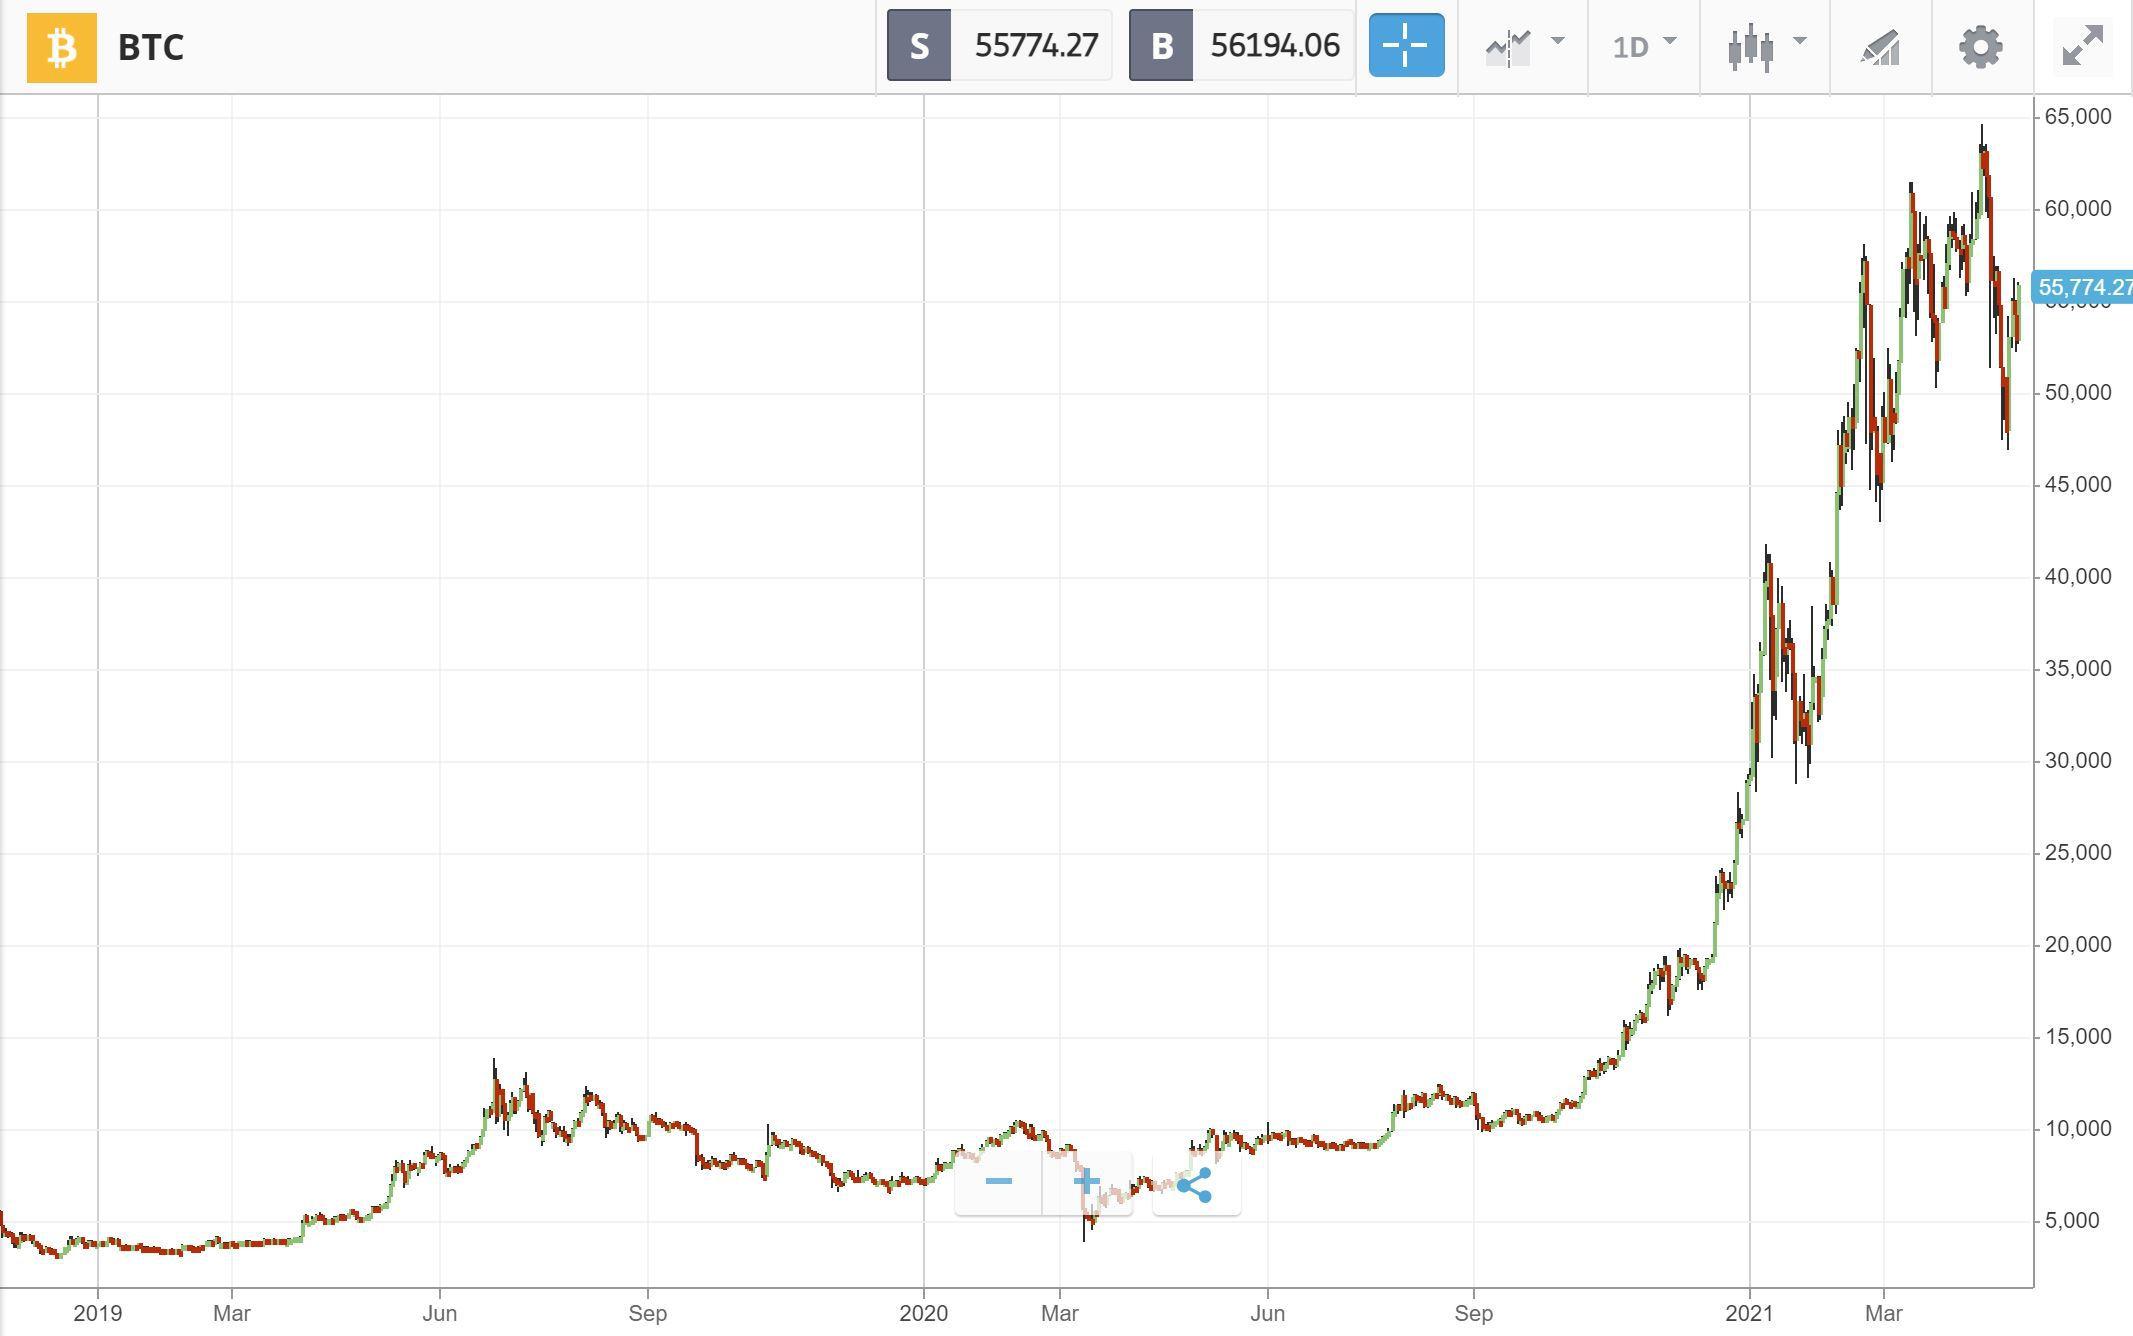 Bitcoin Long Term Performance